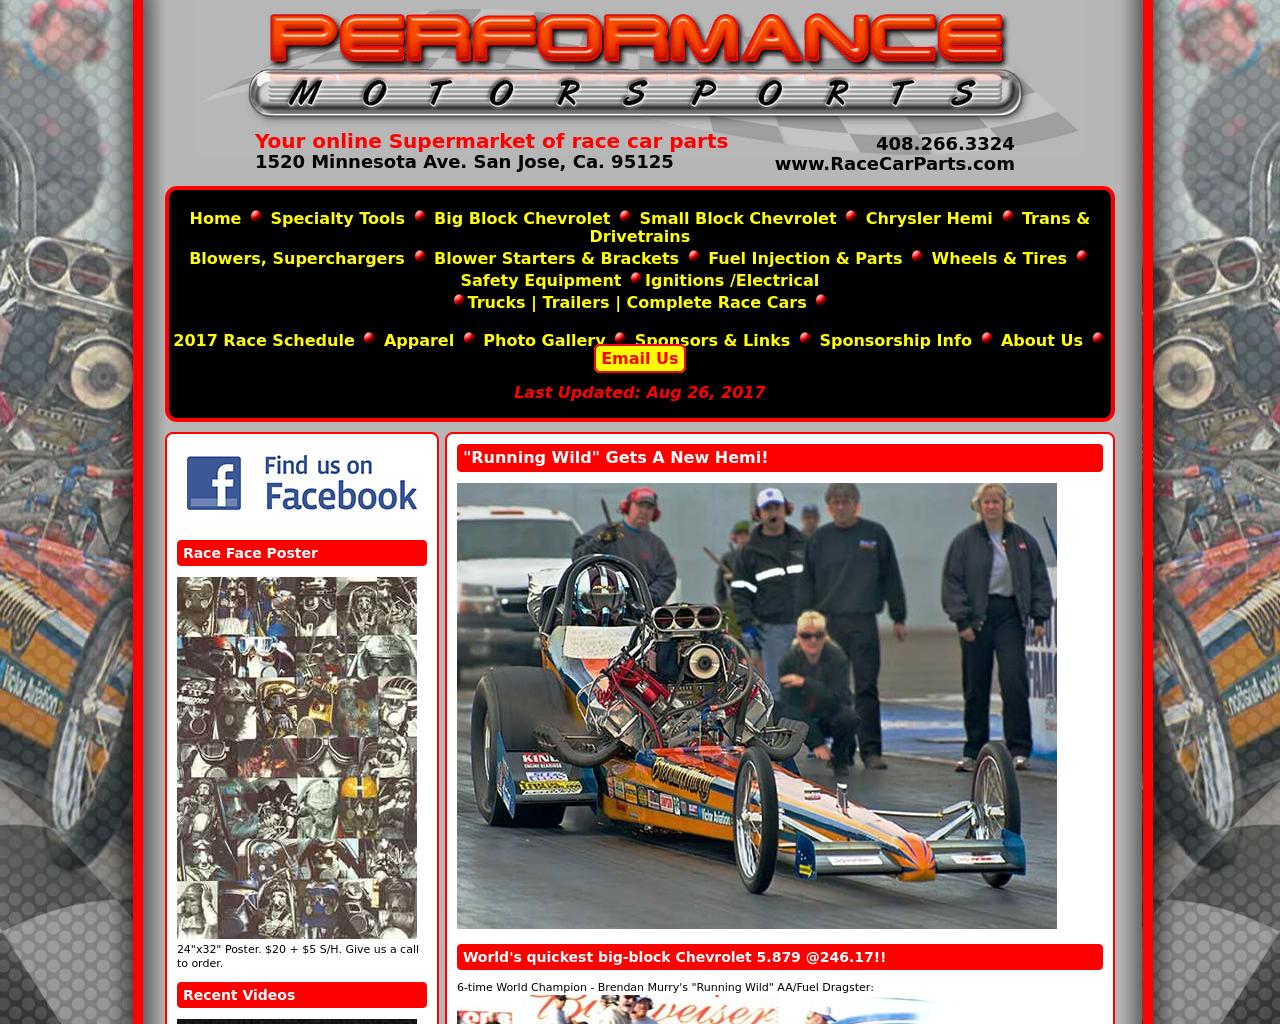 Performance-Motorsports-Advertising-Reviews-Pricing